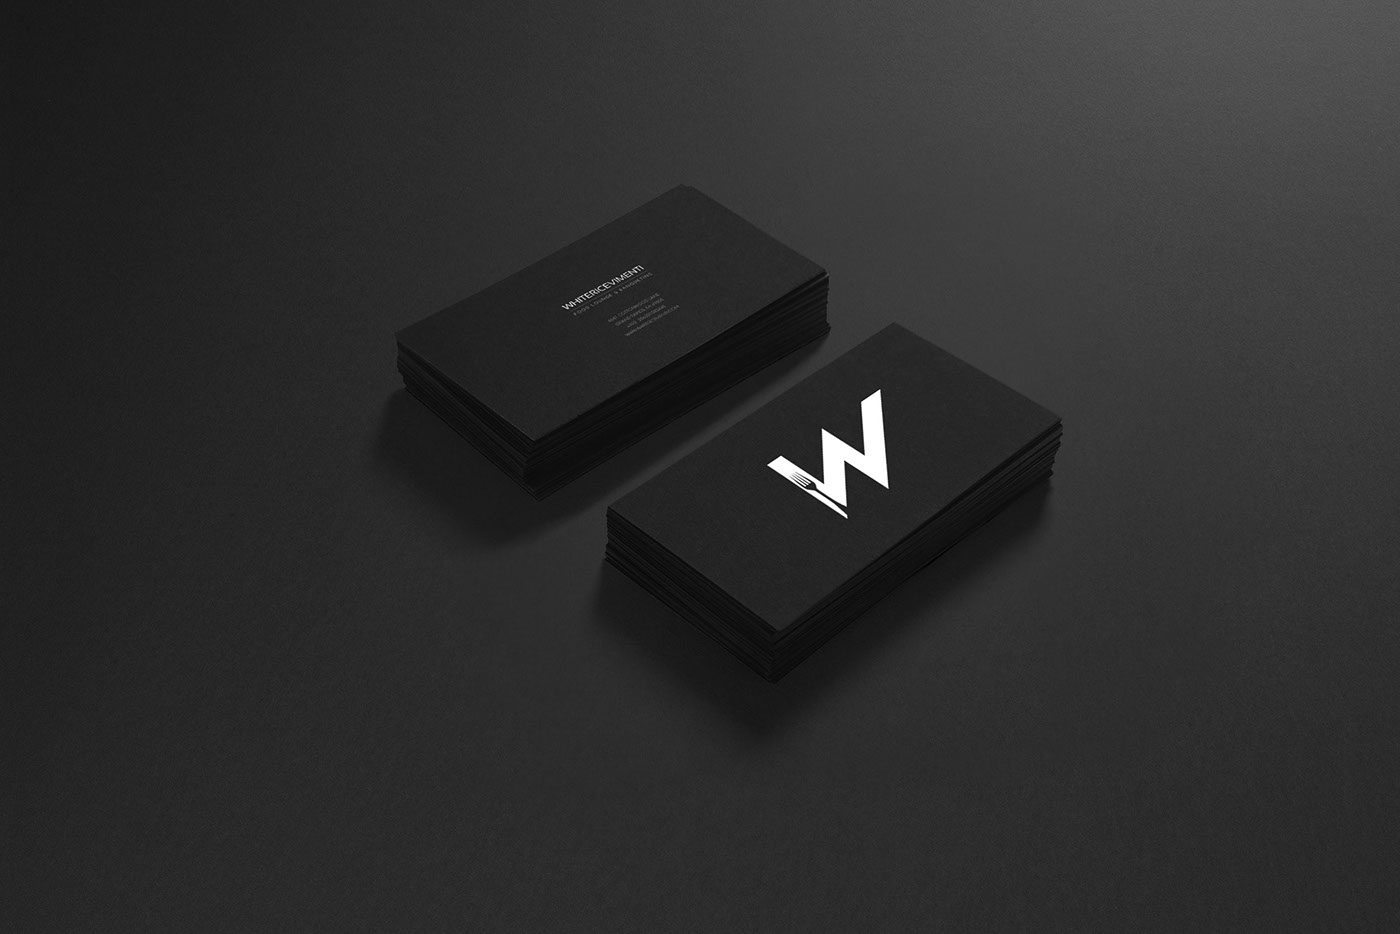 print stationary business card Layout Mockup design